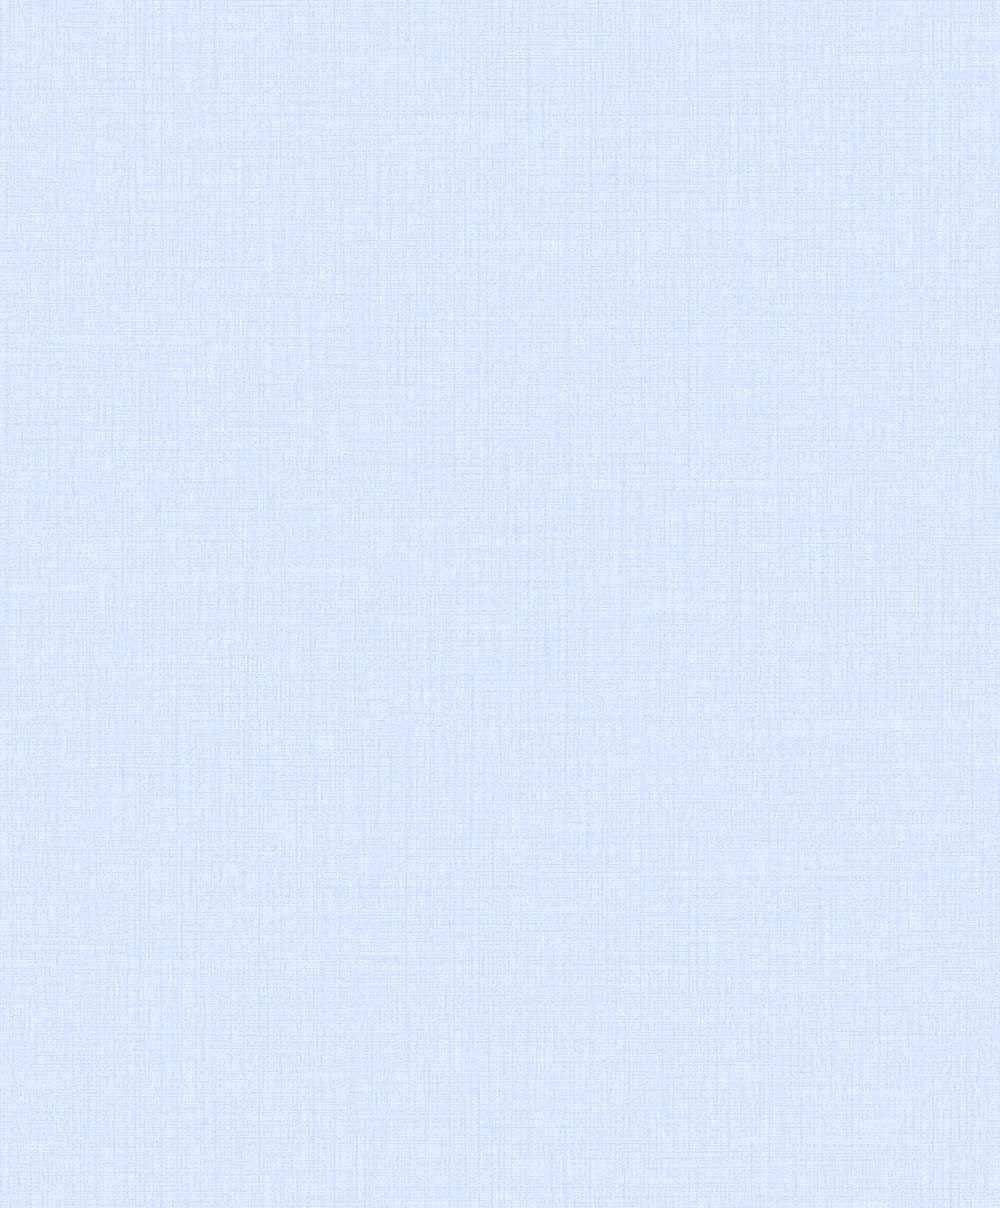 Grandeco Plain Weave Blue Wallpaper - Product code: LO1004